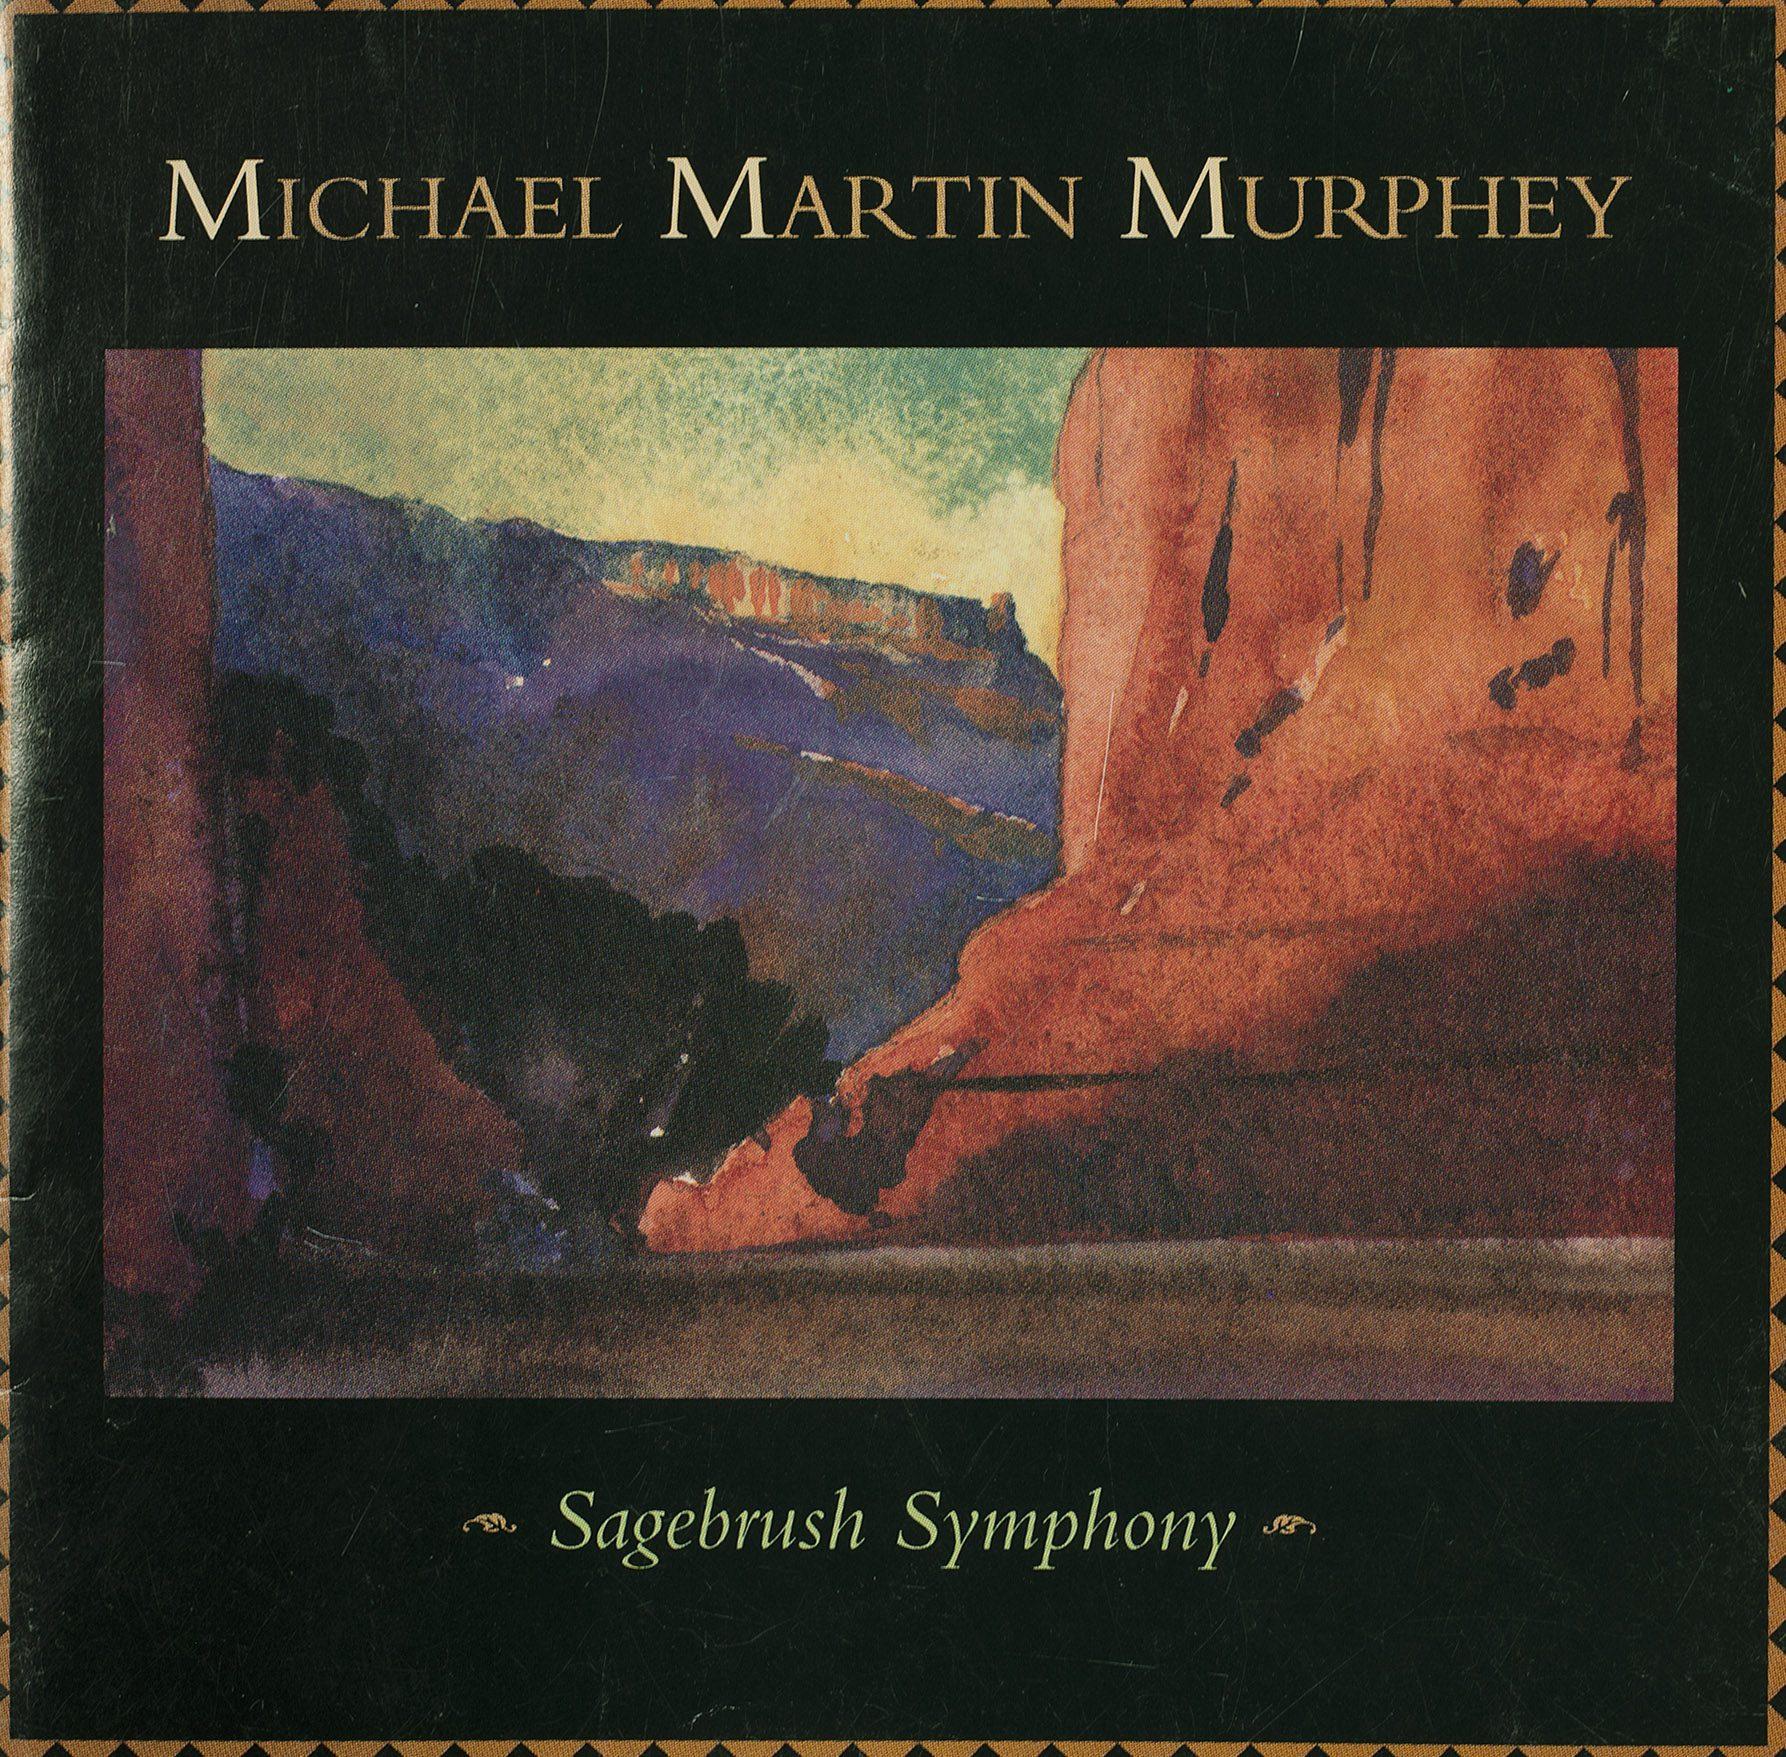 Sagebrush Symphony